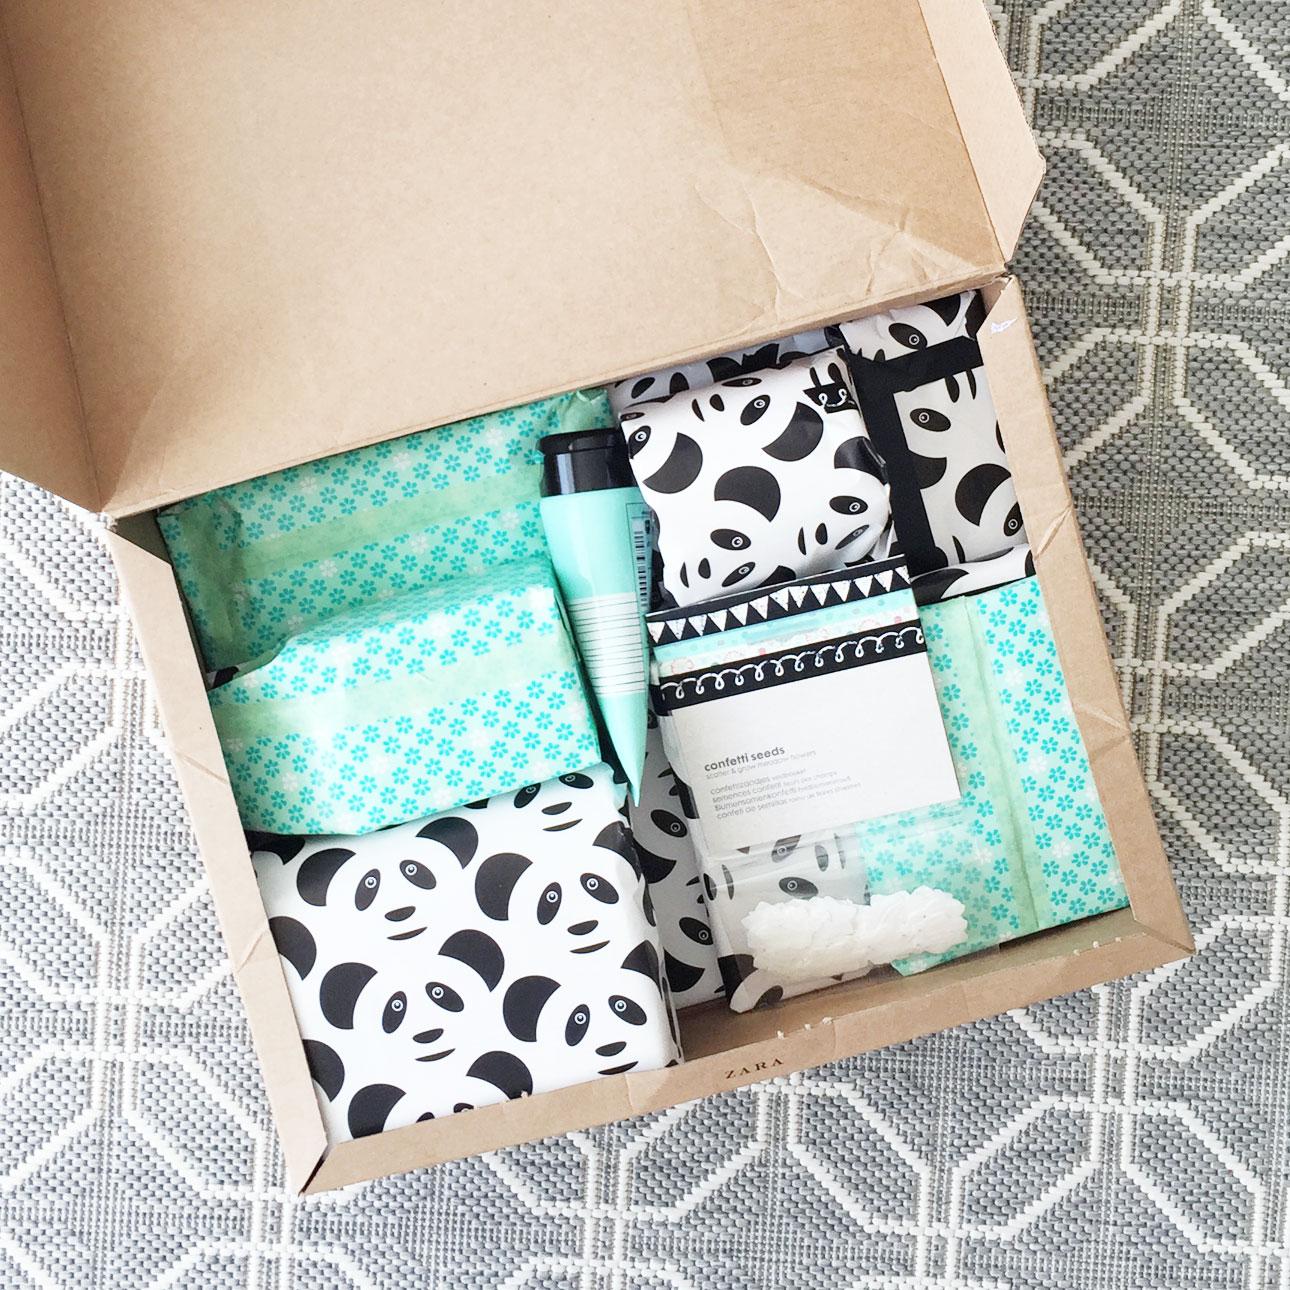 styleswapnl pakket cadeautjes ingepakt